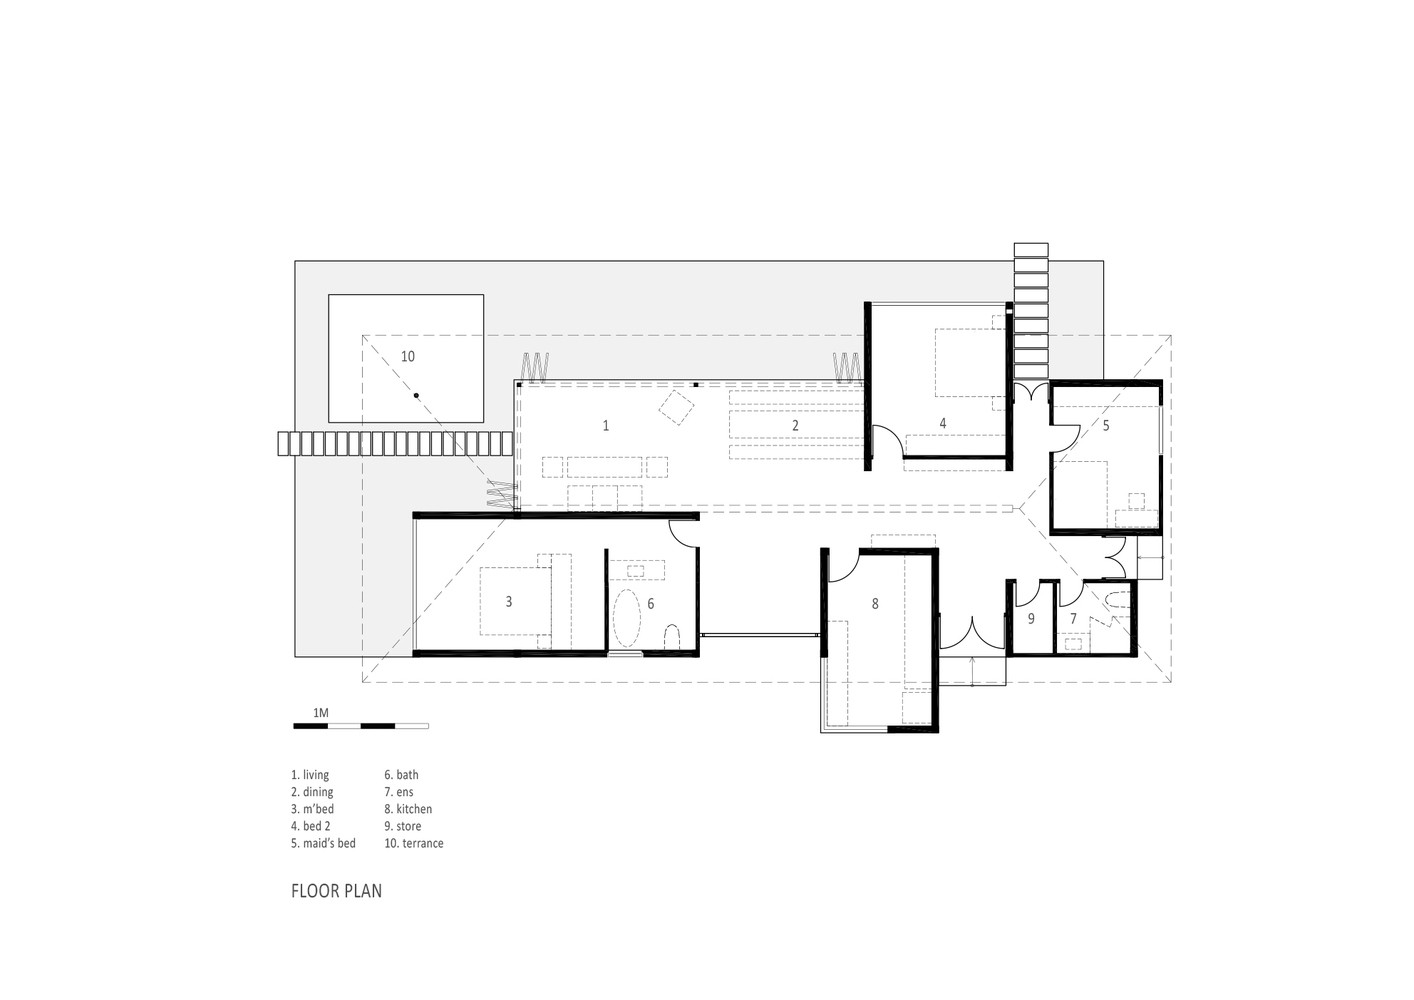 03-CTA-Am_house-illu-1-2-Flr_plan